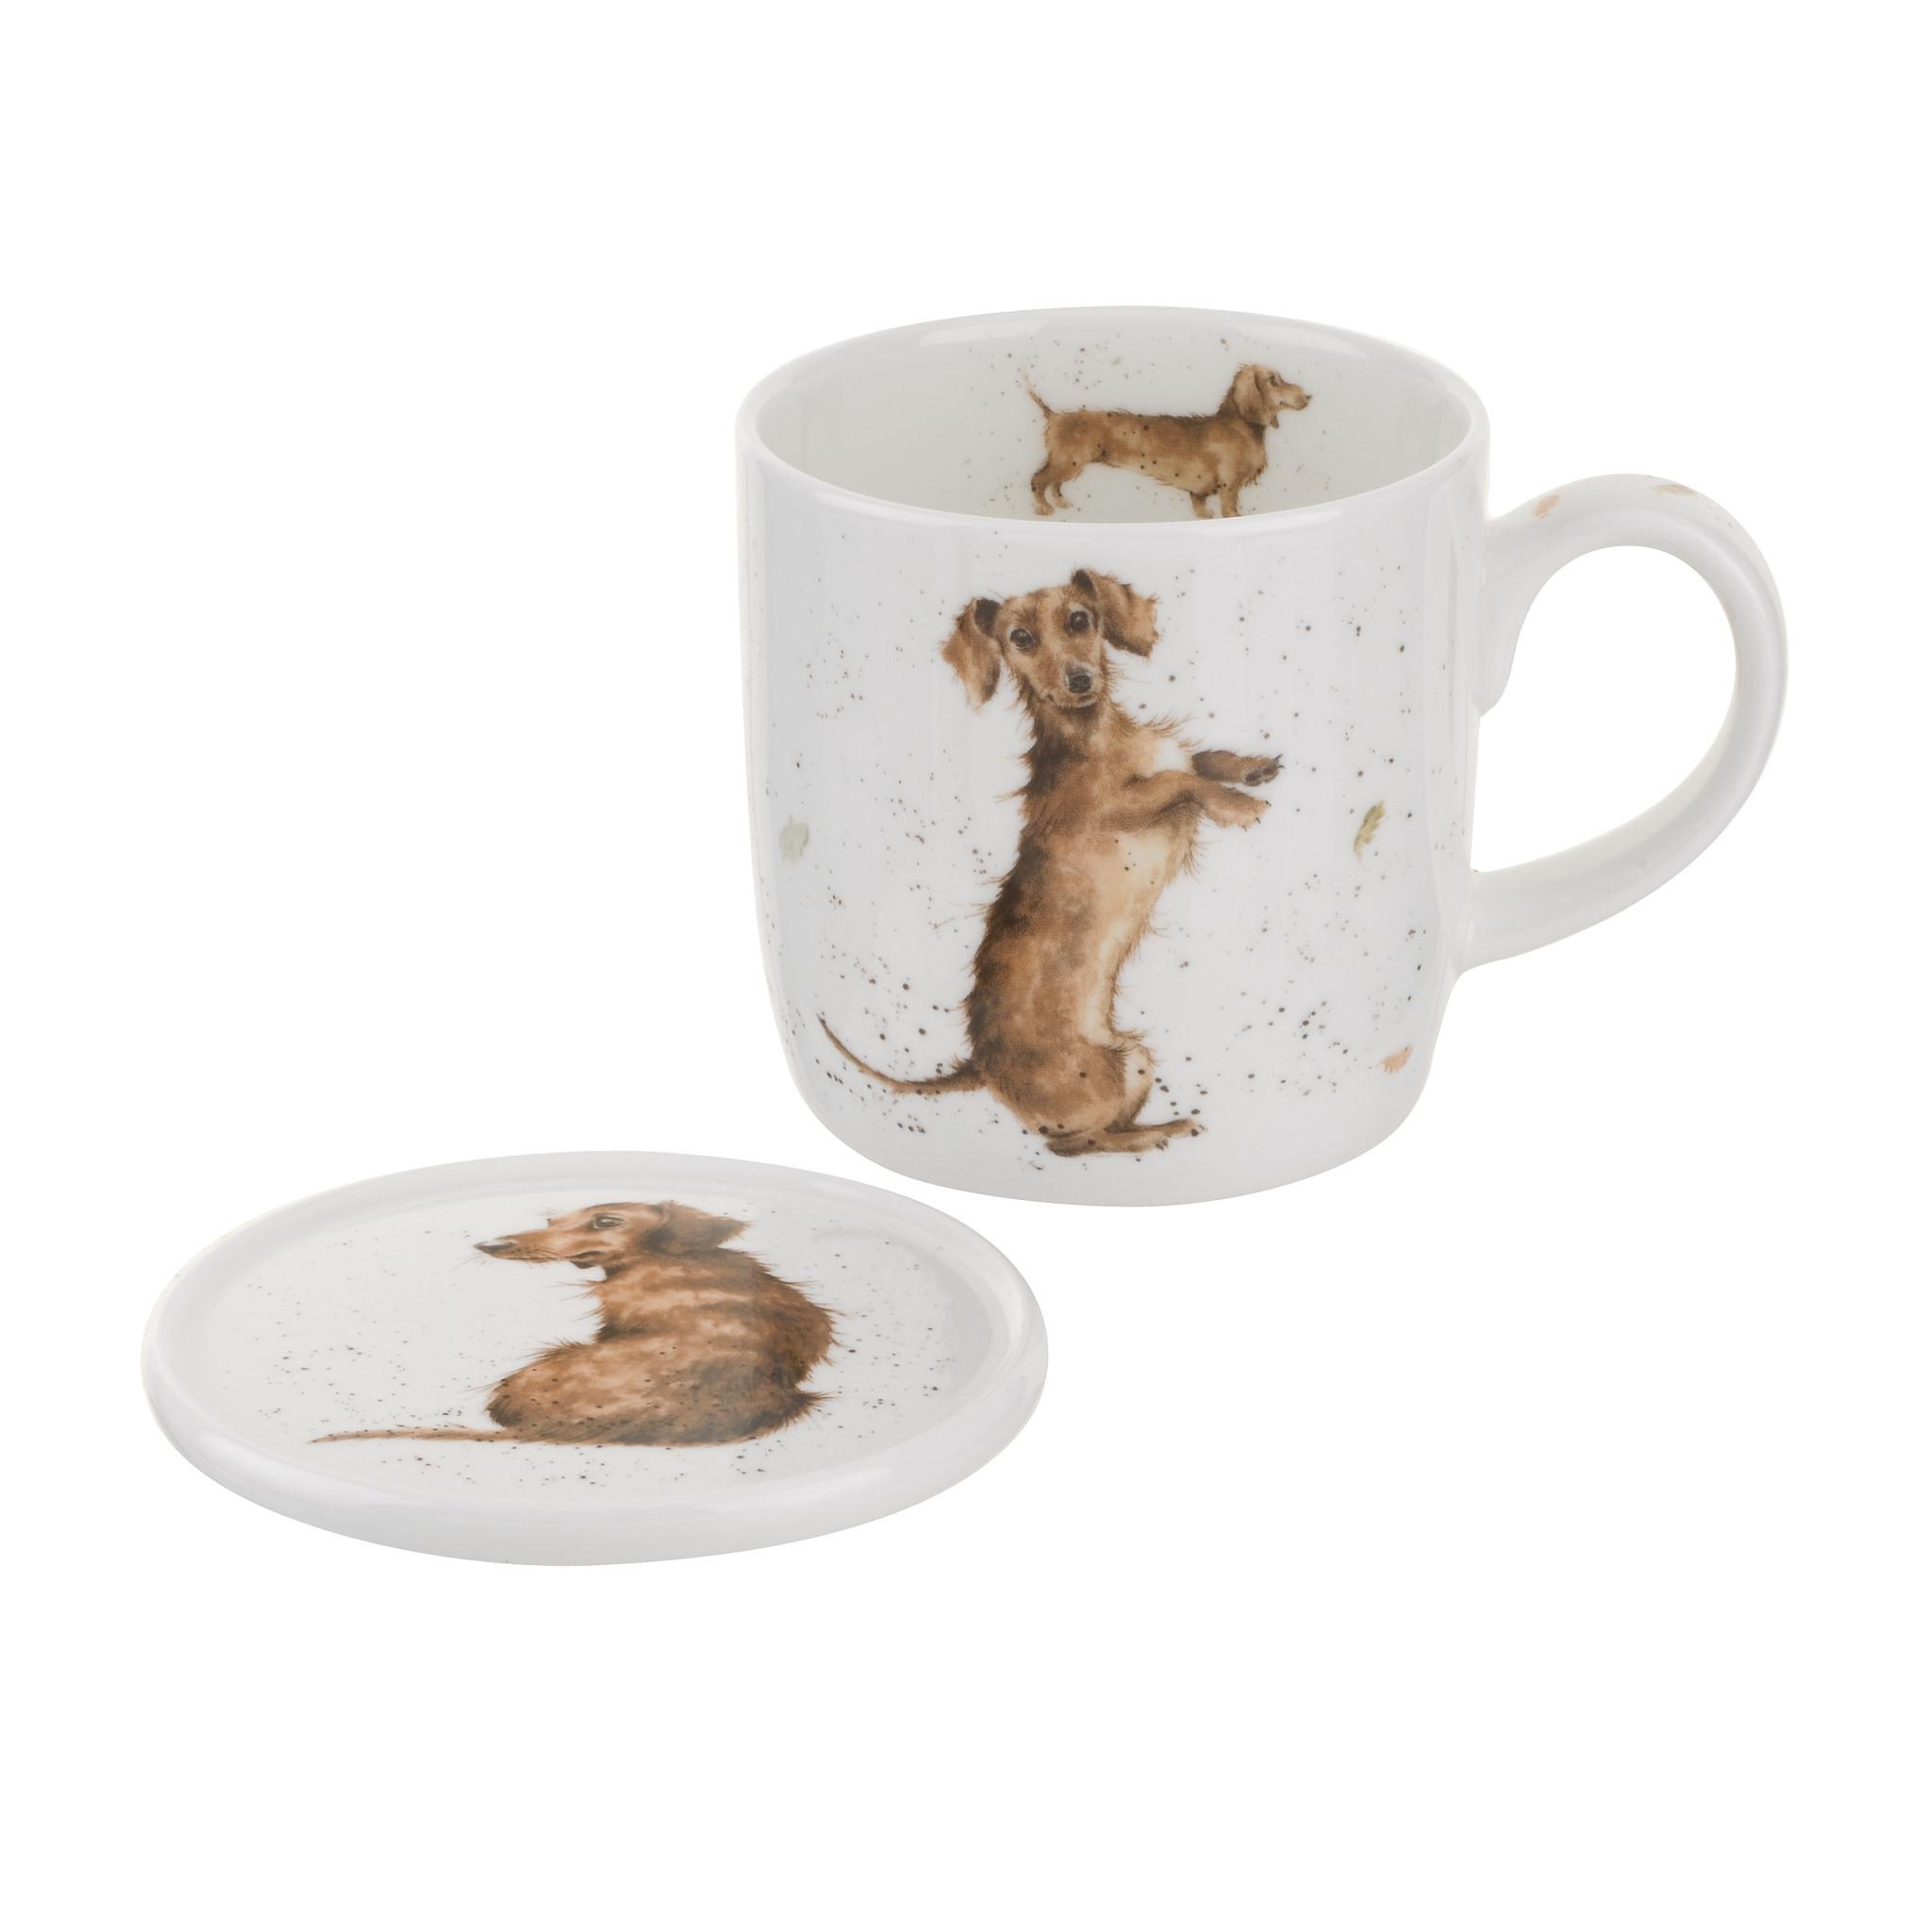 Wrendale Designs 'Sausage Dog' Mug & Coaster Set